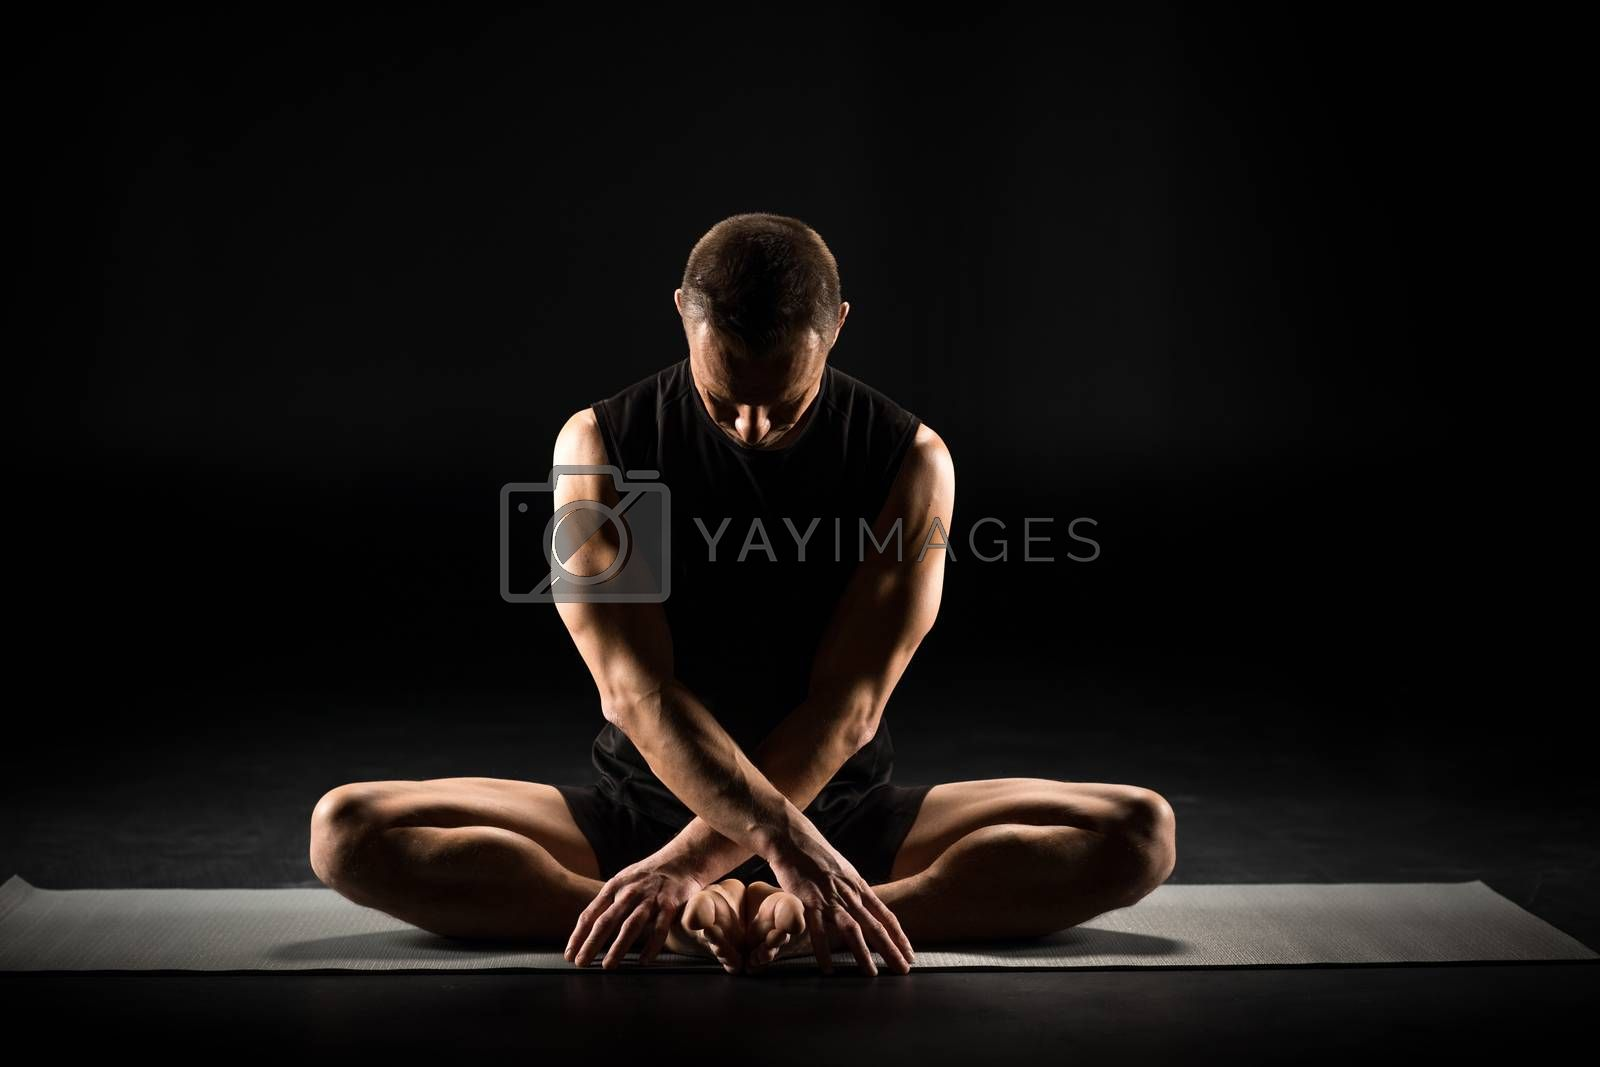 Man performing Baddha Konasana on yoga mat